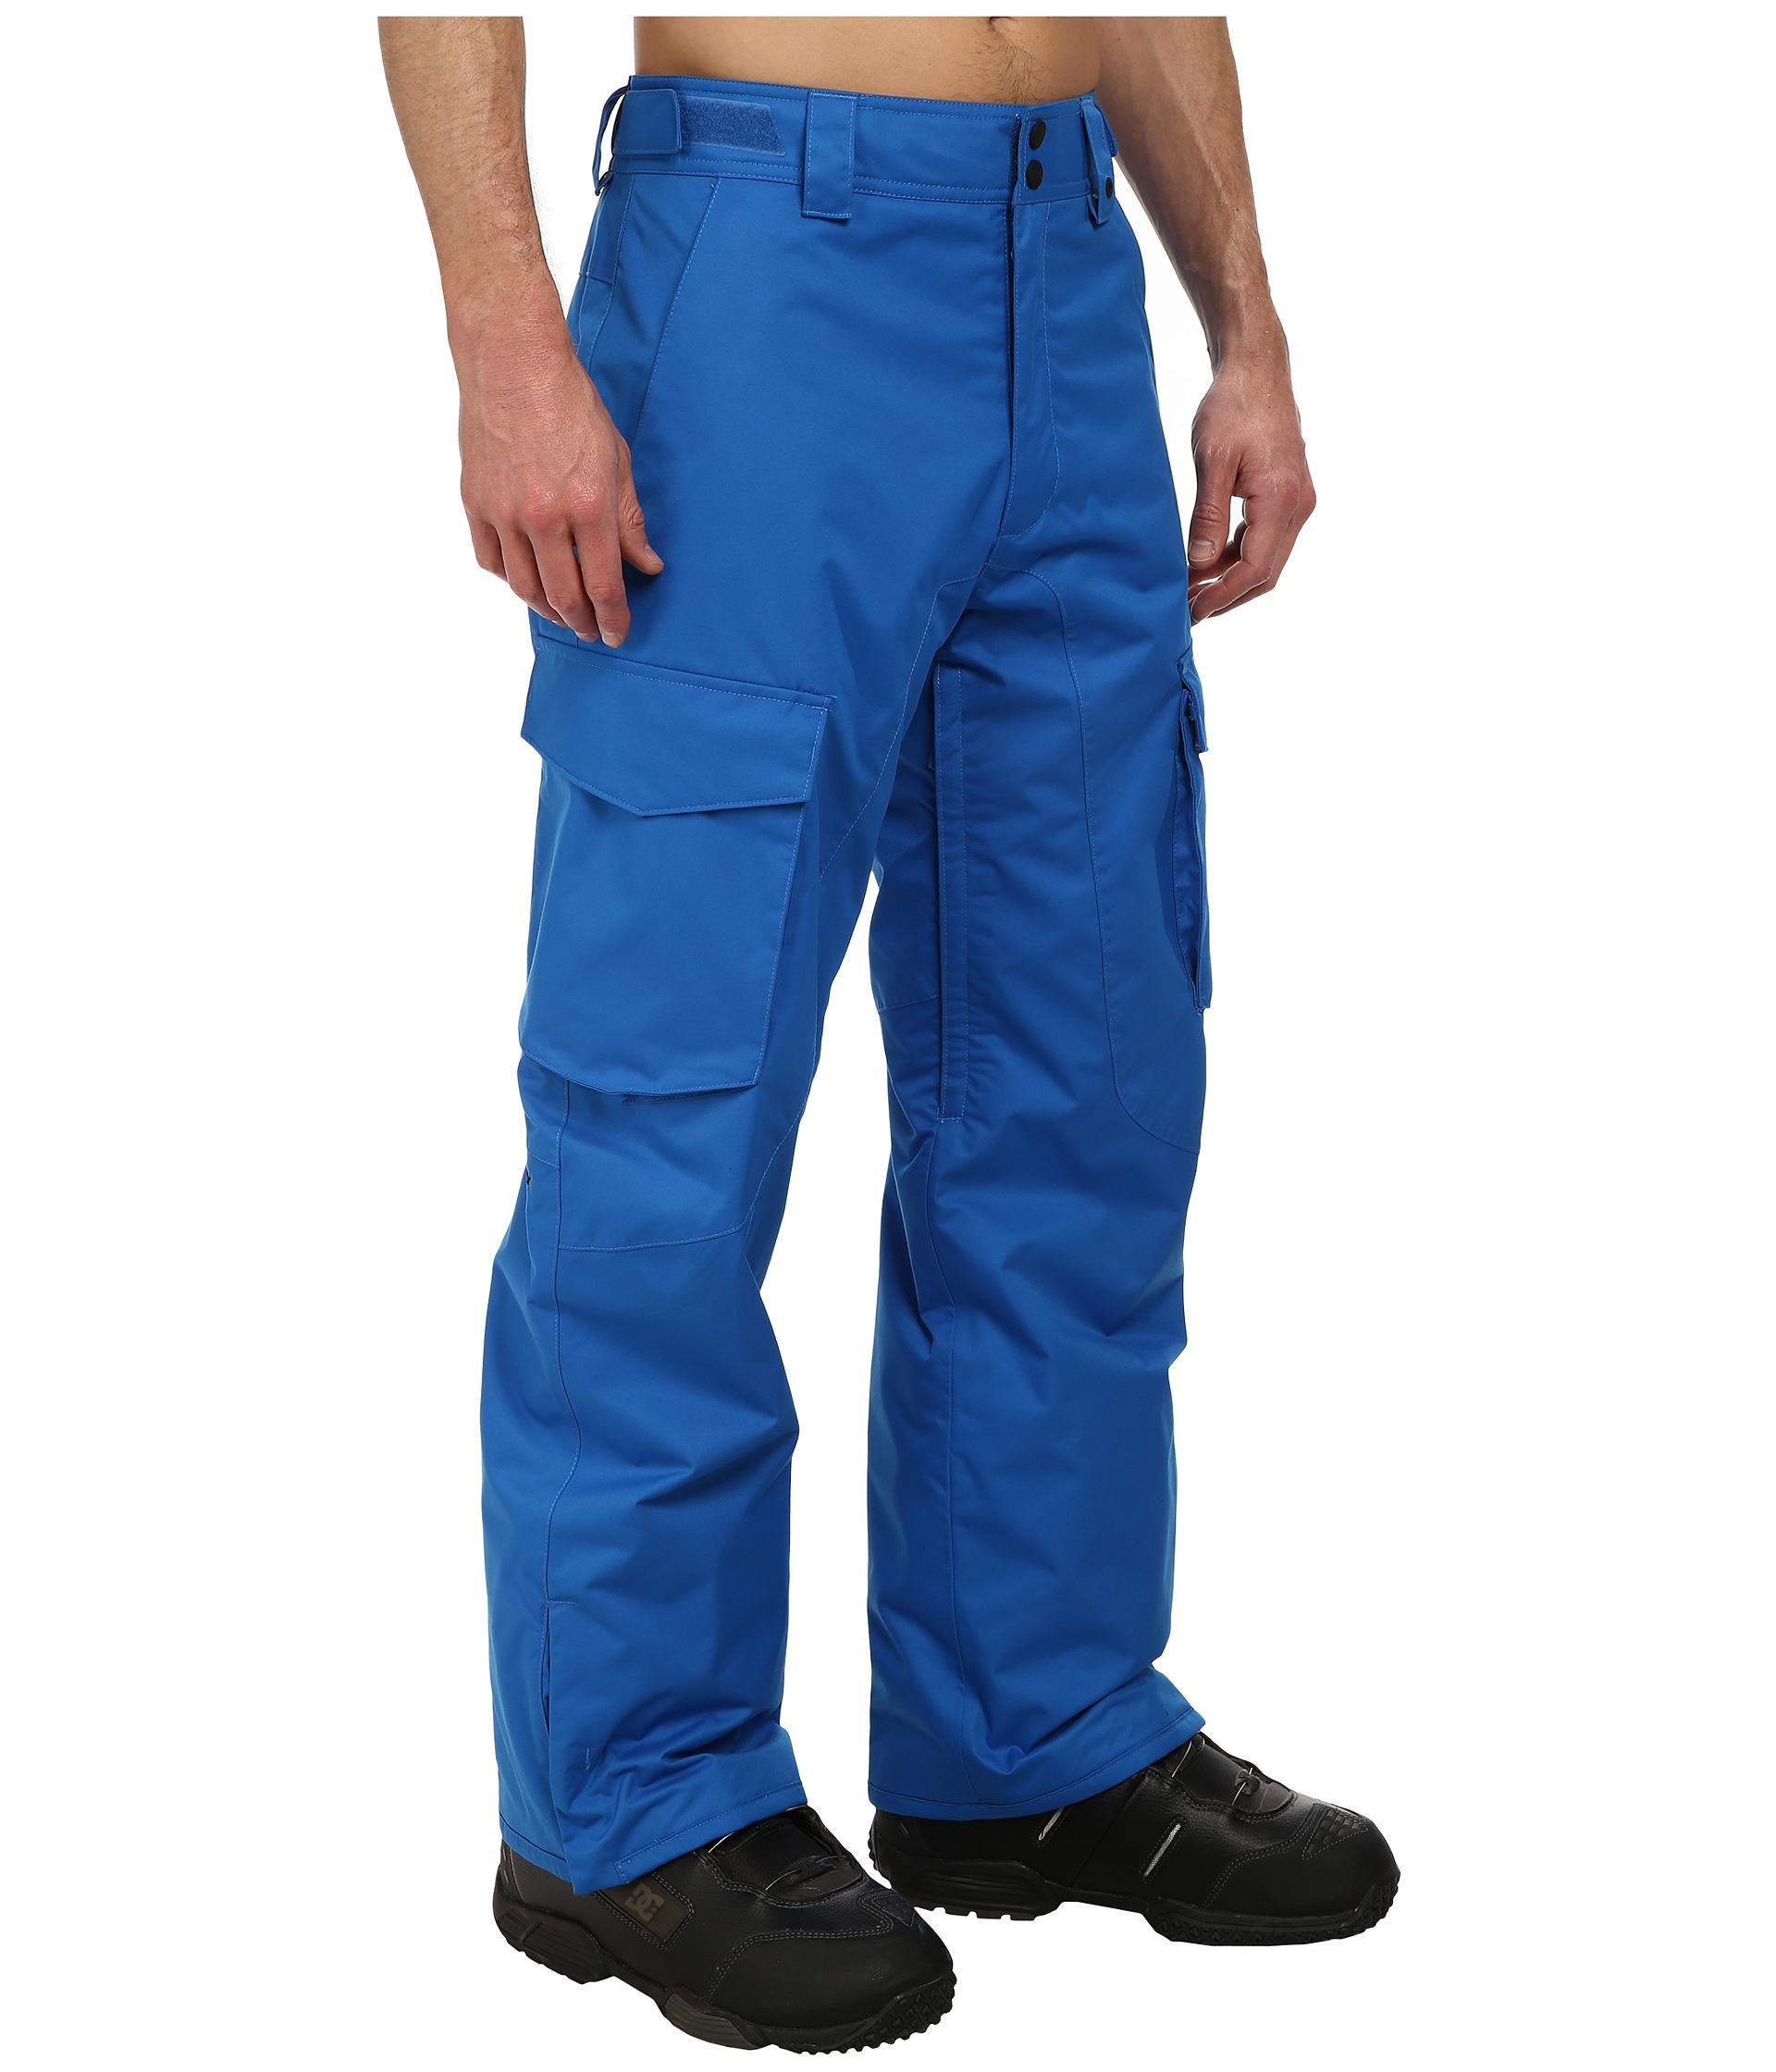 626d7862e1 Lyst - Oakley Task Force Shell Cargo Pant in Blue for Men